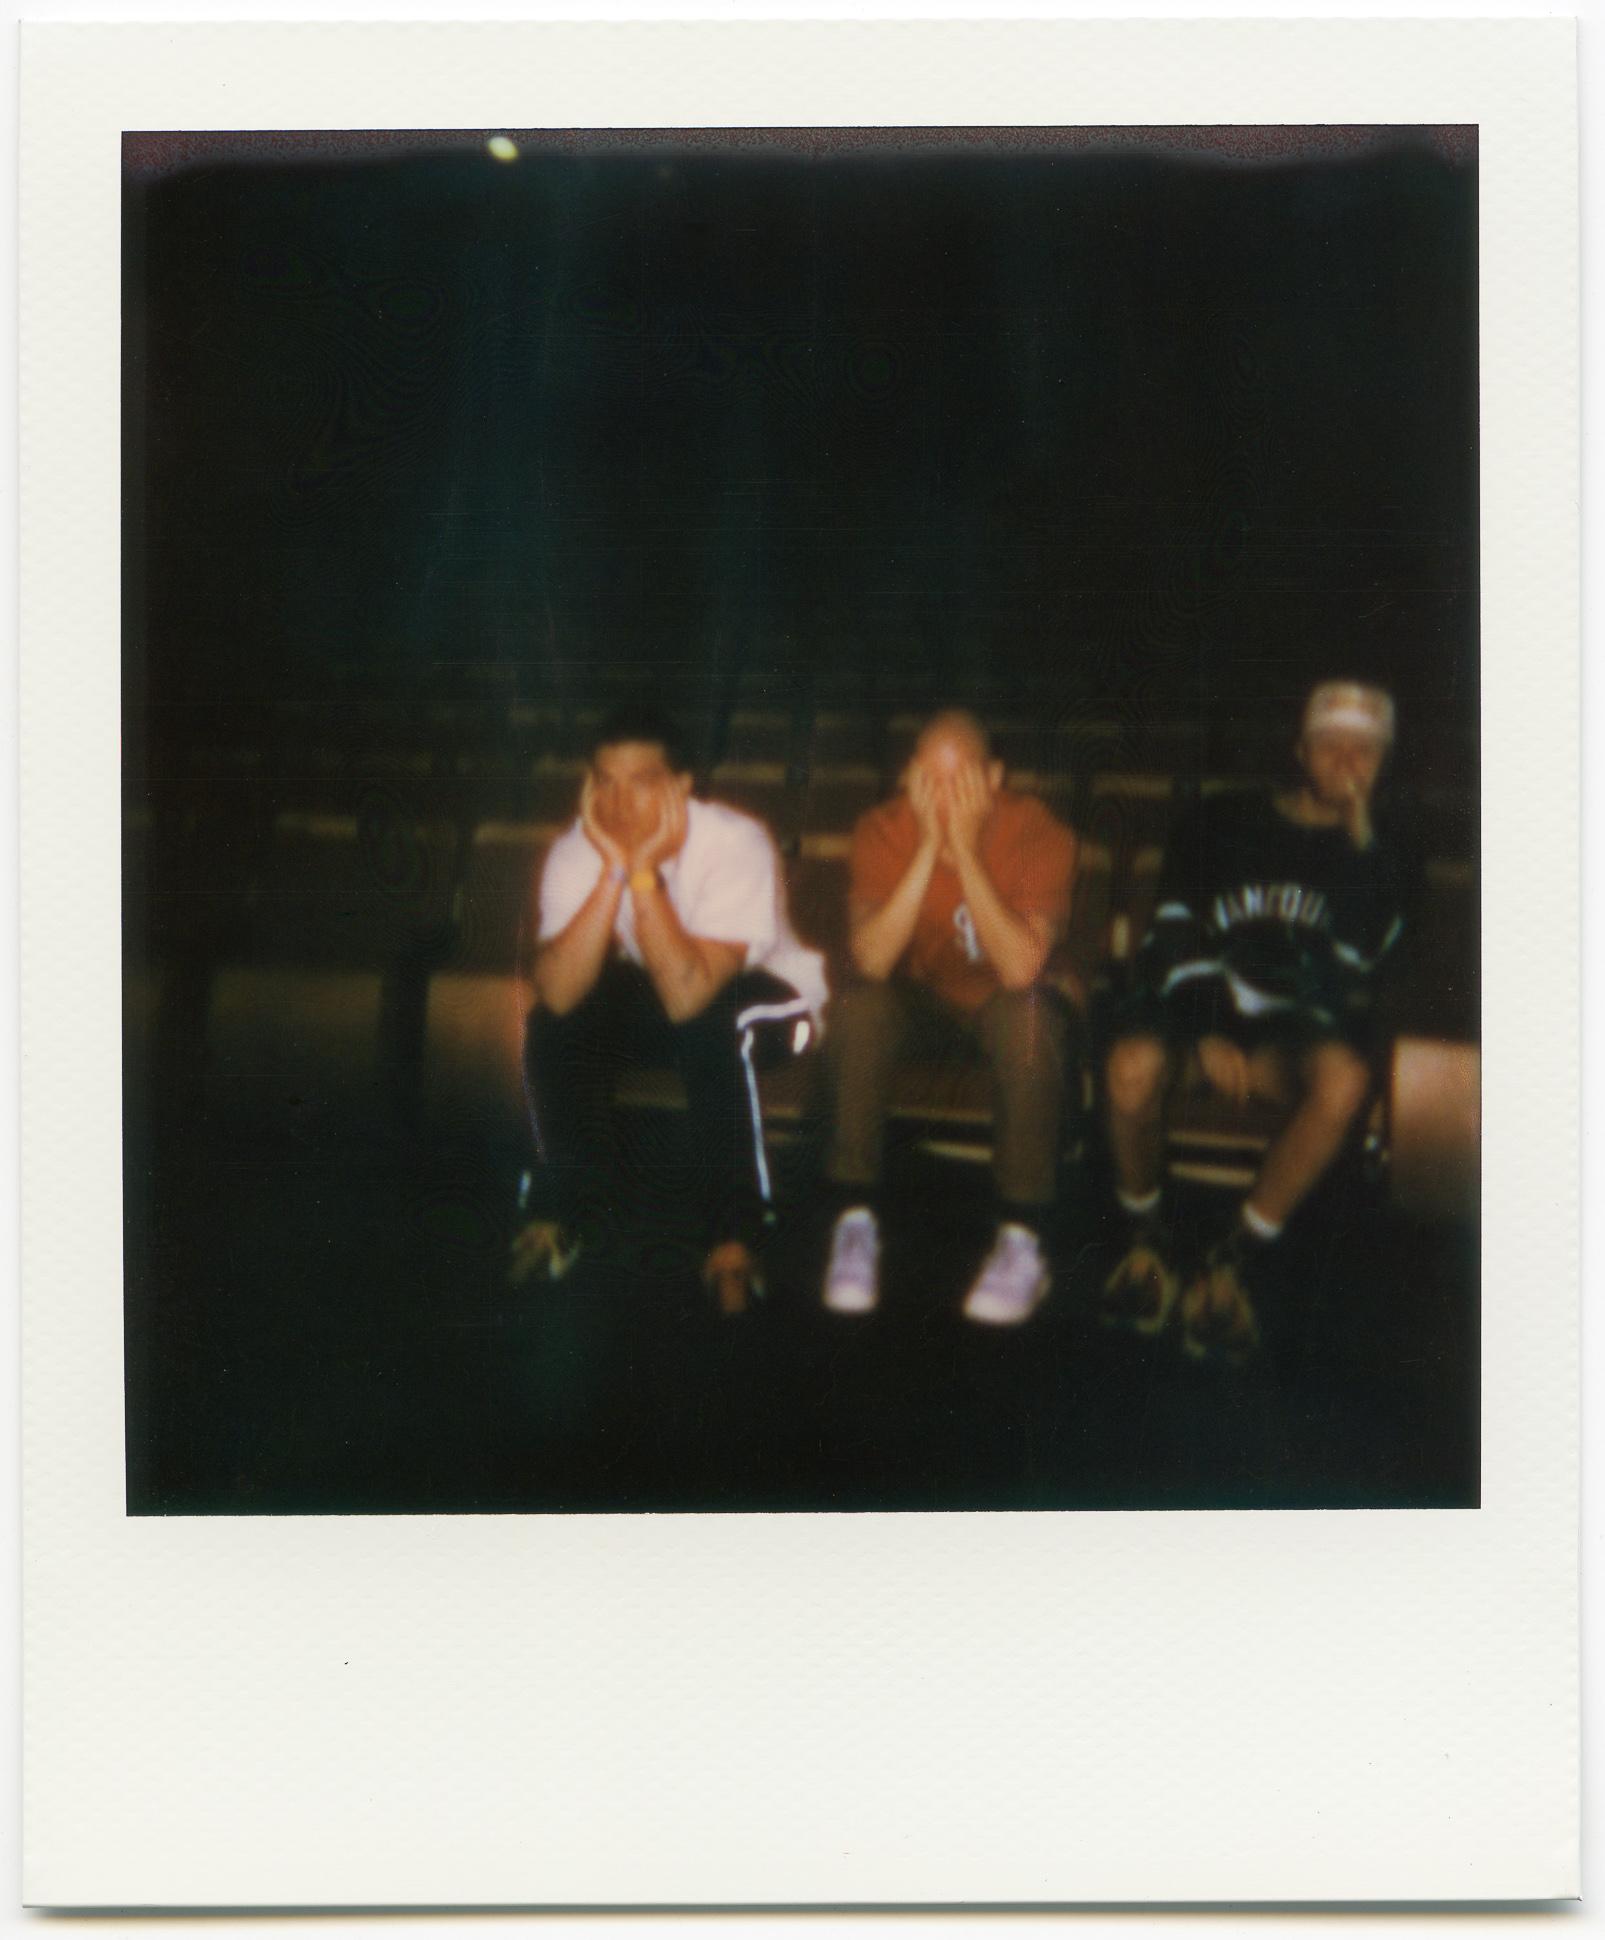 LANY-Polaroid-17-06-2019-Vancouver-8.jpg